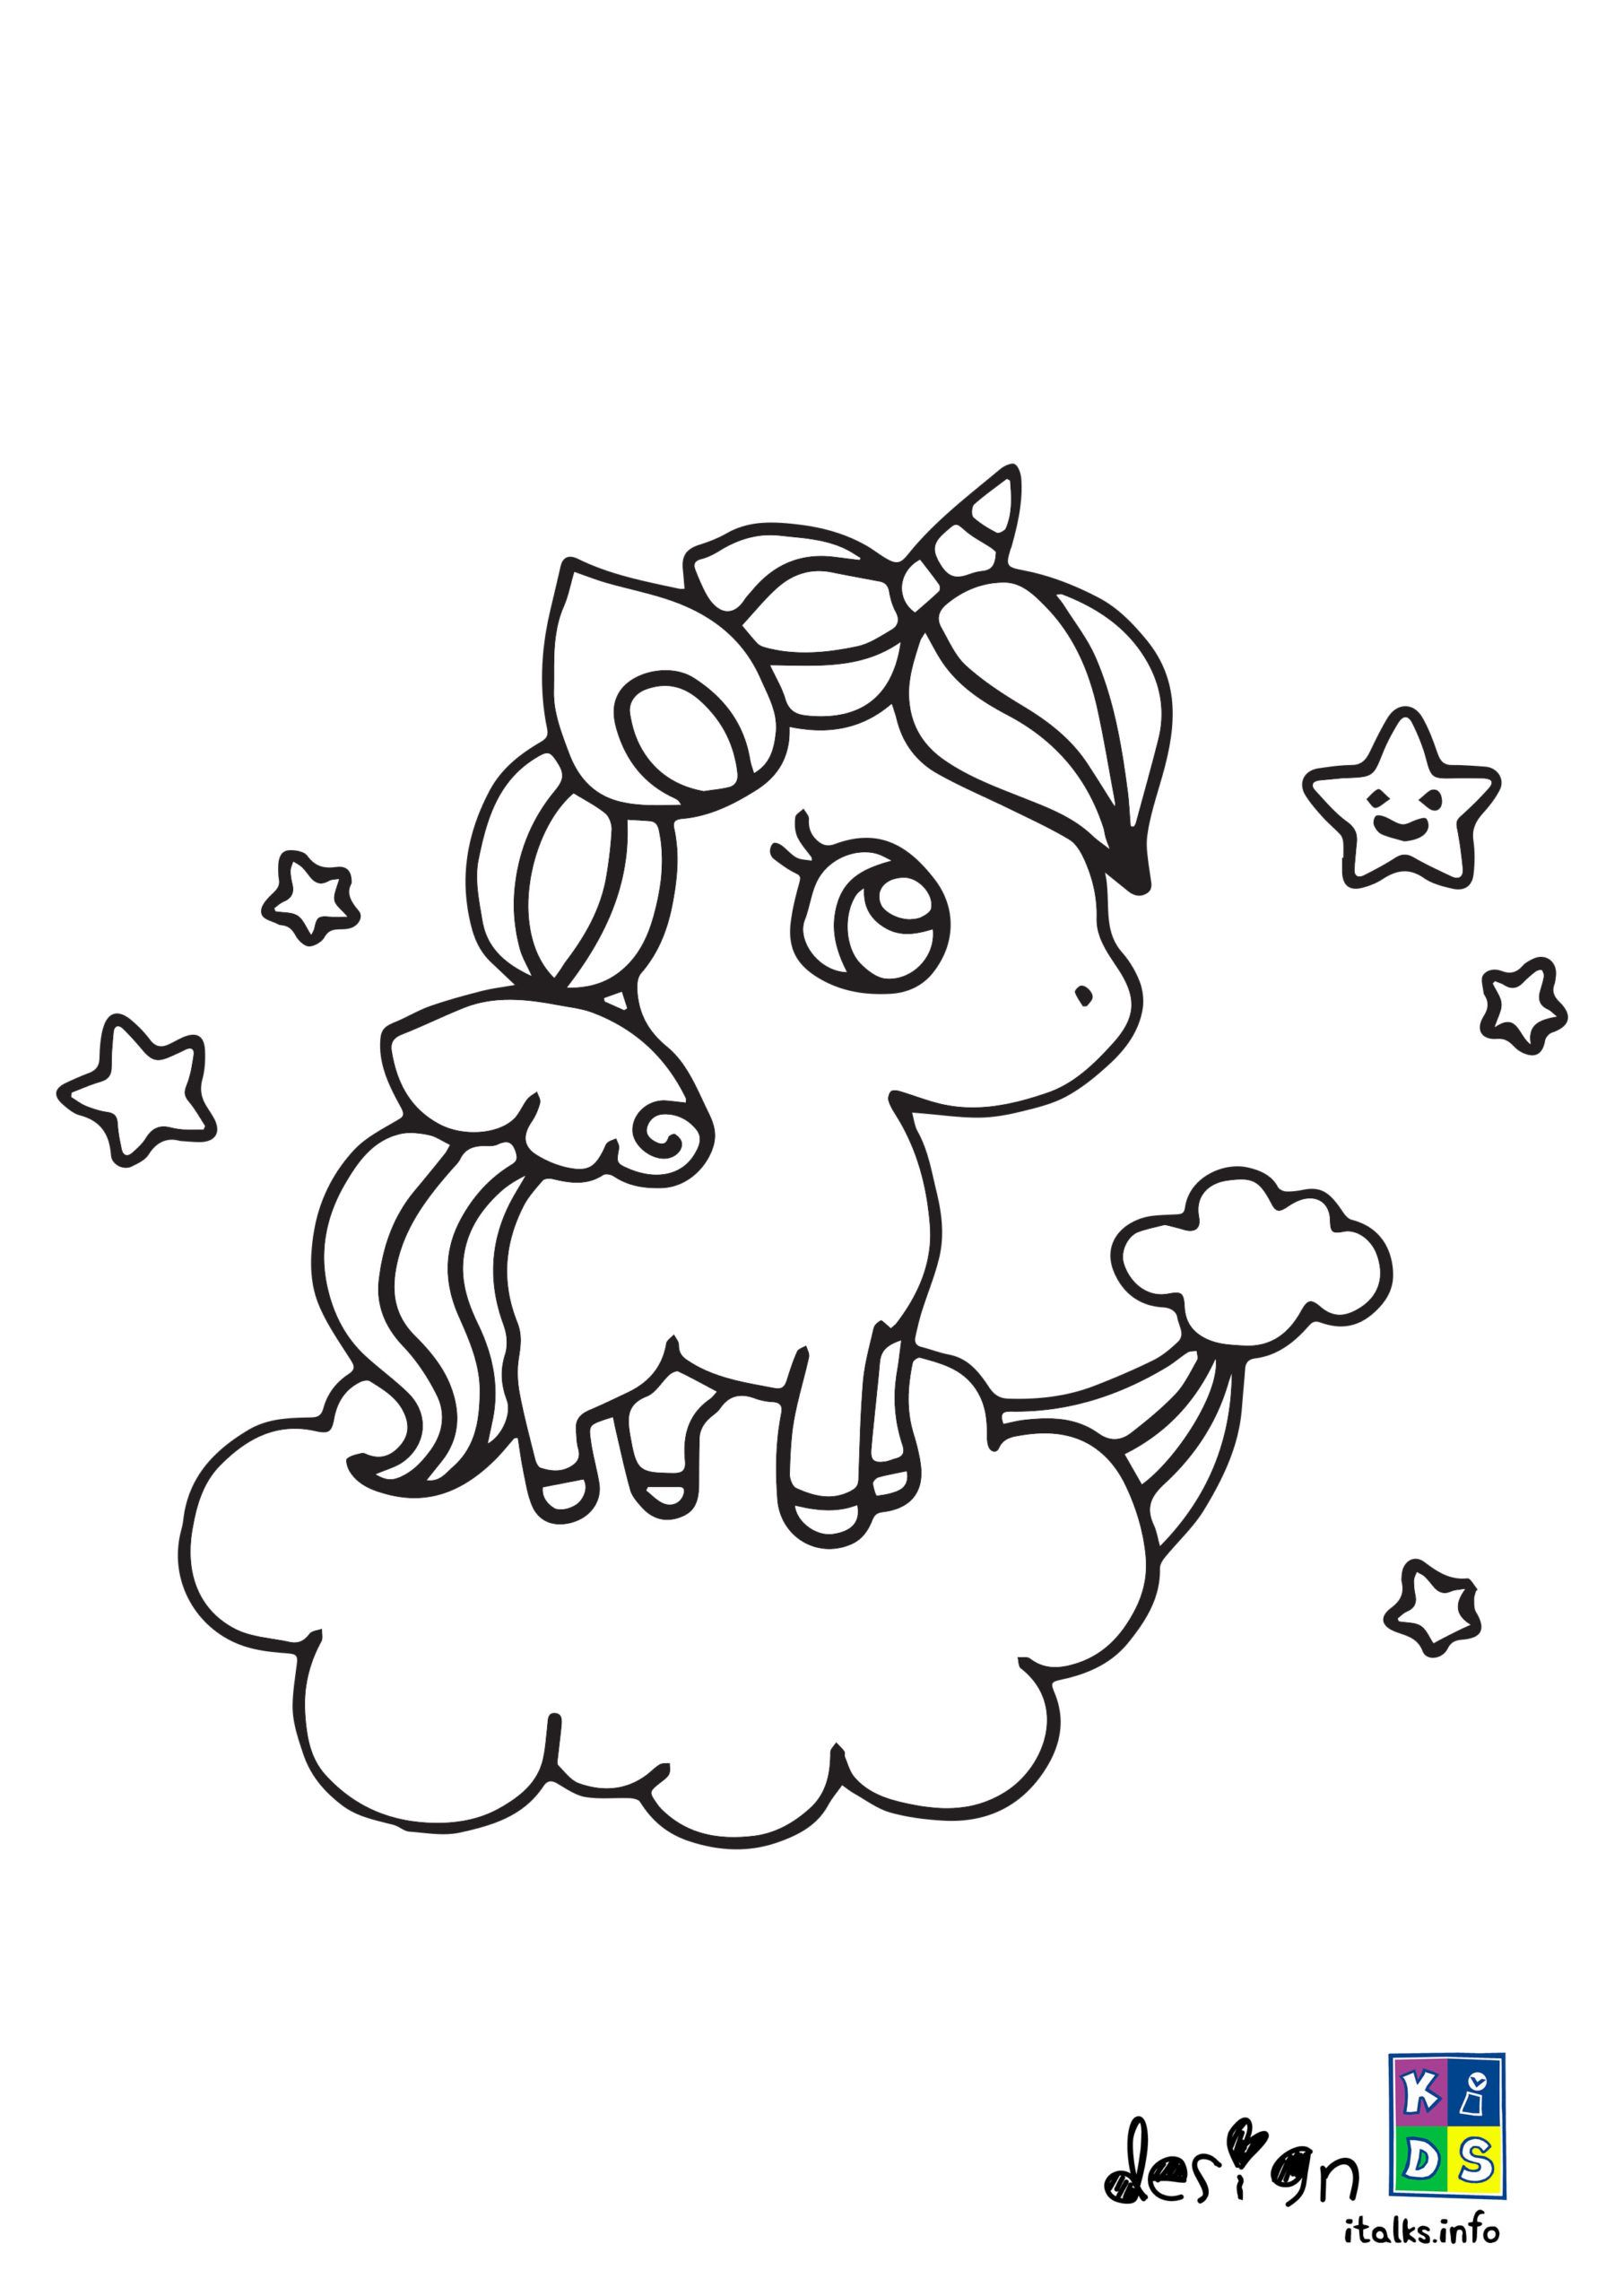 Unicorn Kawaii Coloring Pages : unicorn, kawaii, coloring, pages, Kawaii, Unicorn, Coloring, Designkids, Pages,, Unicorn,, Pages